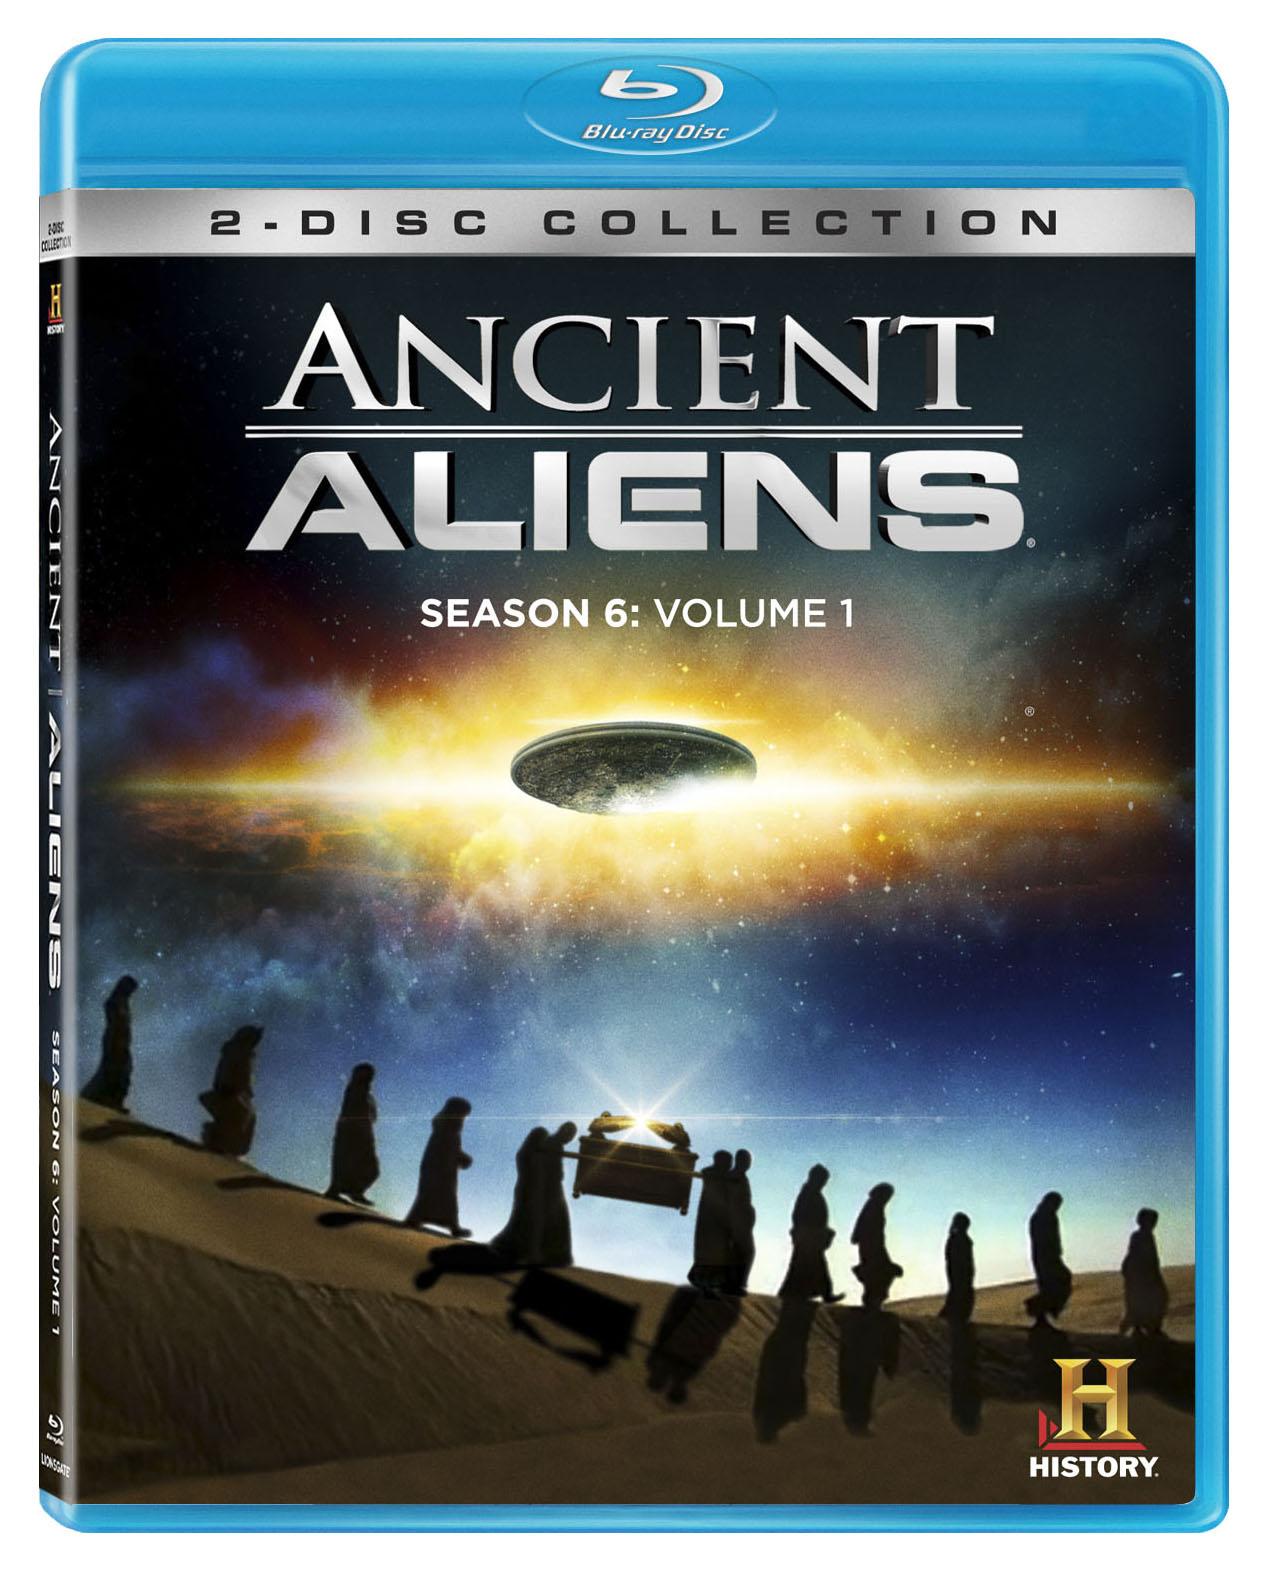 Ancient Aliens: Season 6